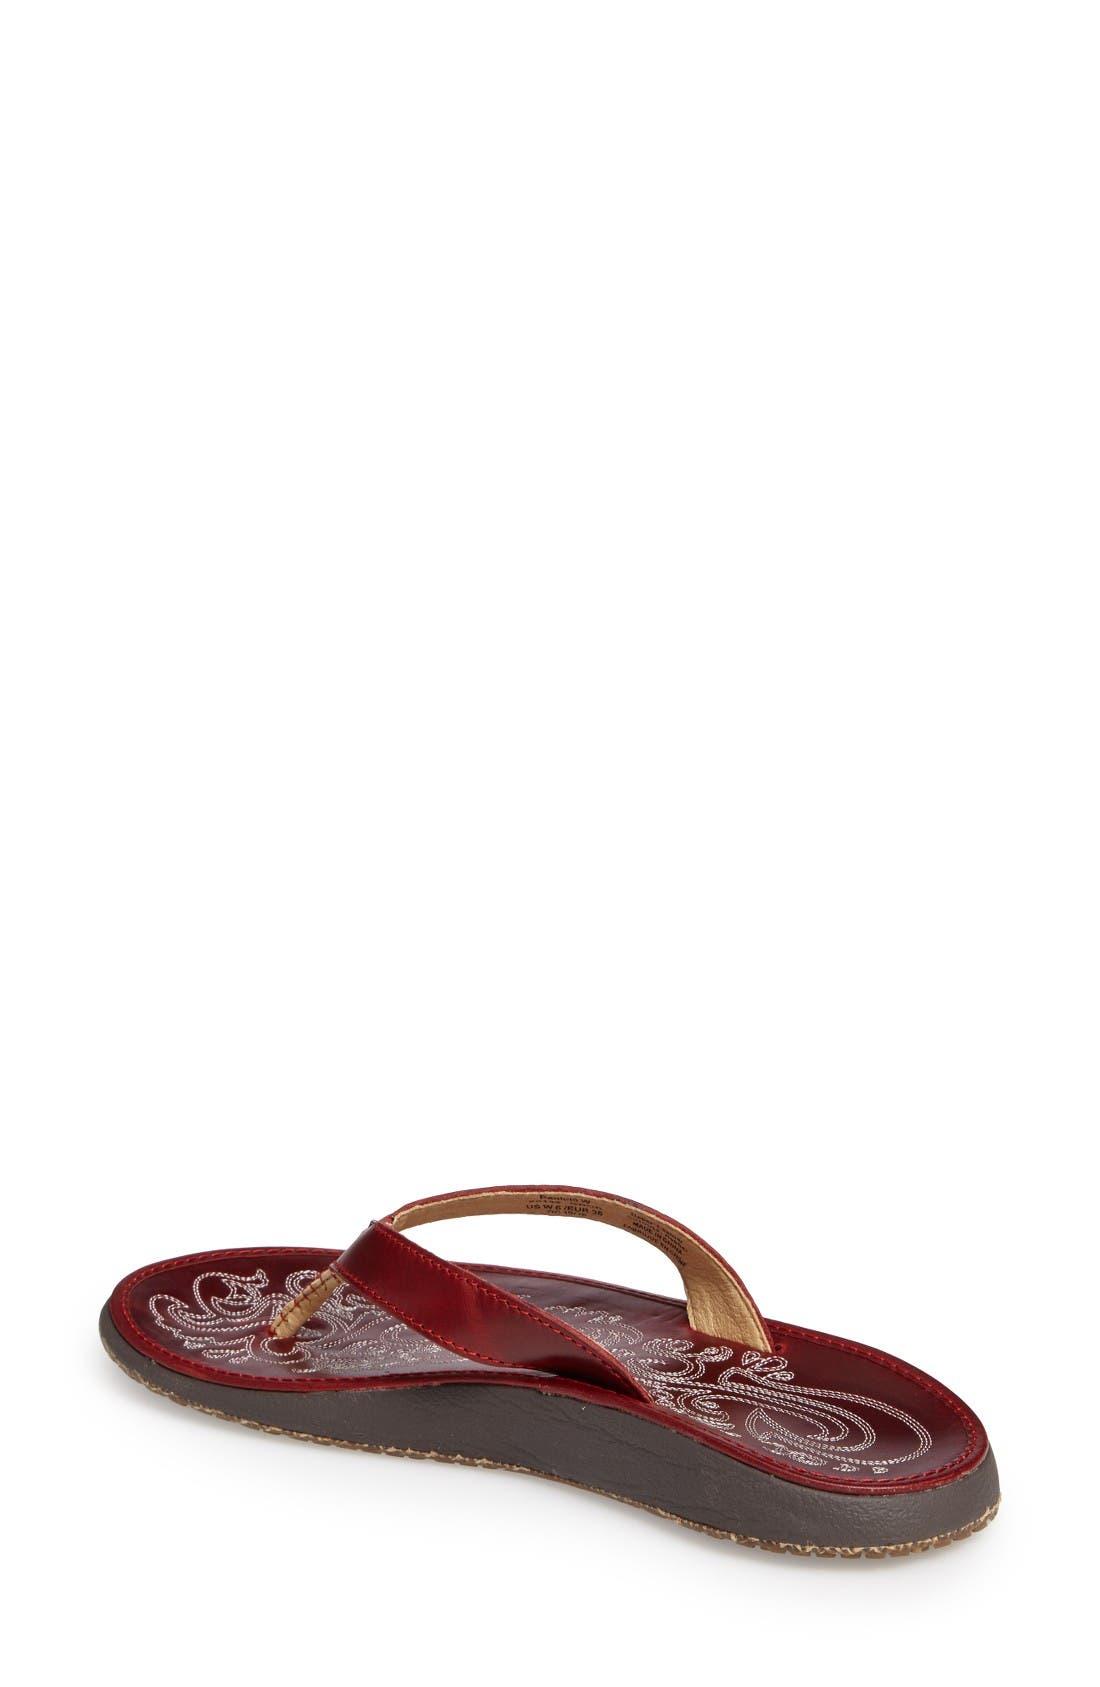 Alternate Image 2  - OluKai 'Paniolo' Thong Sandal